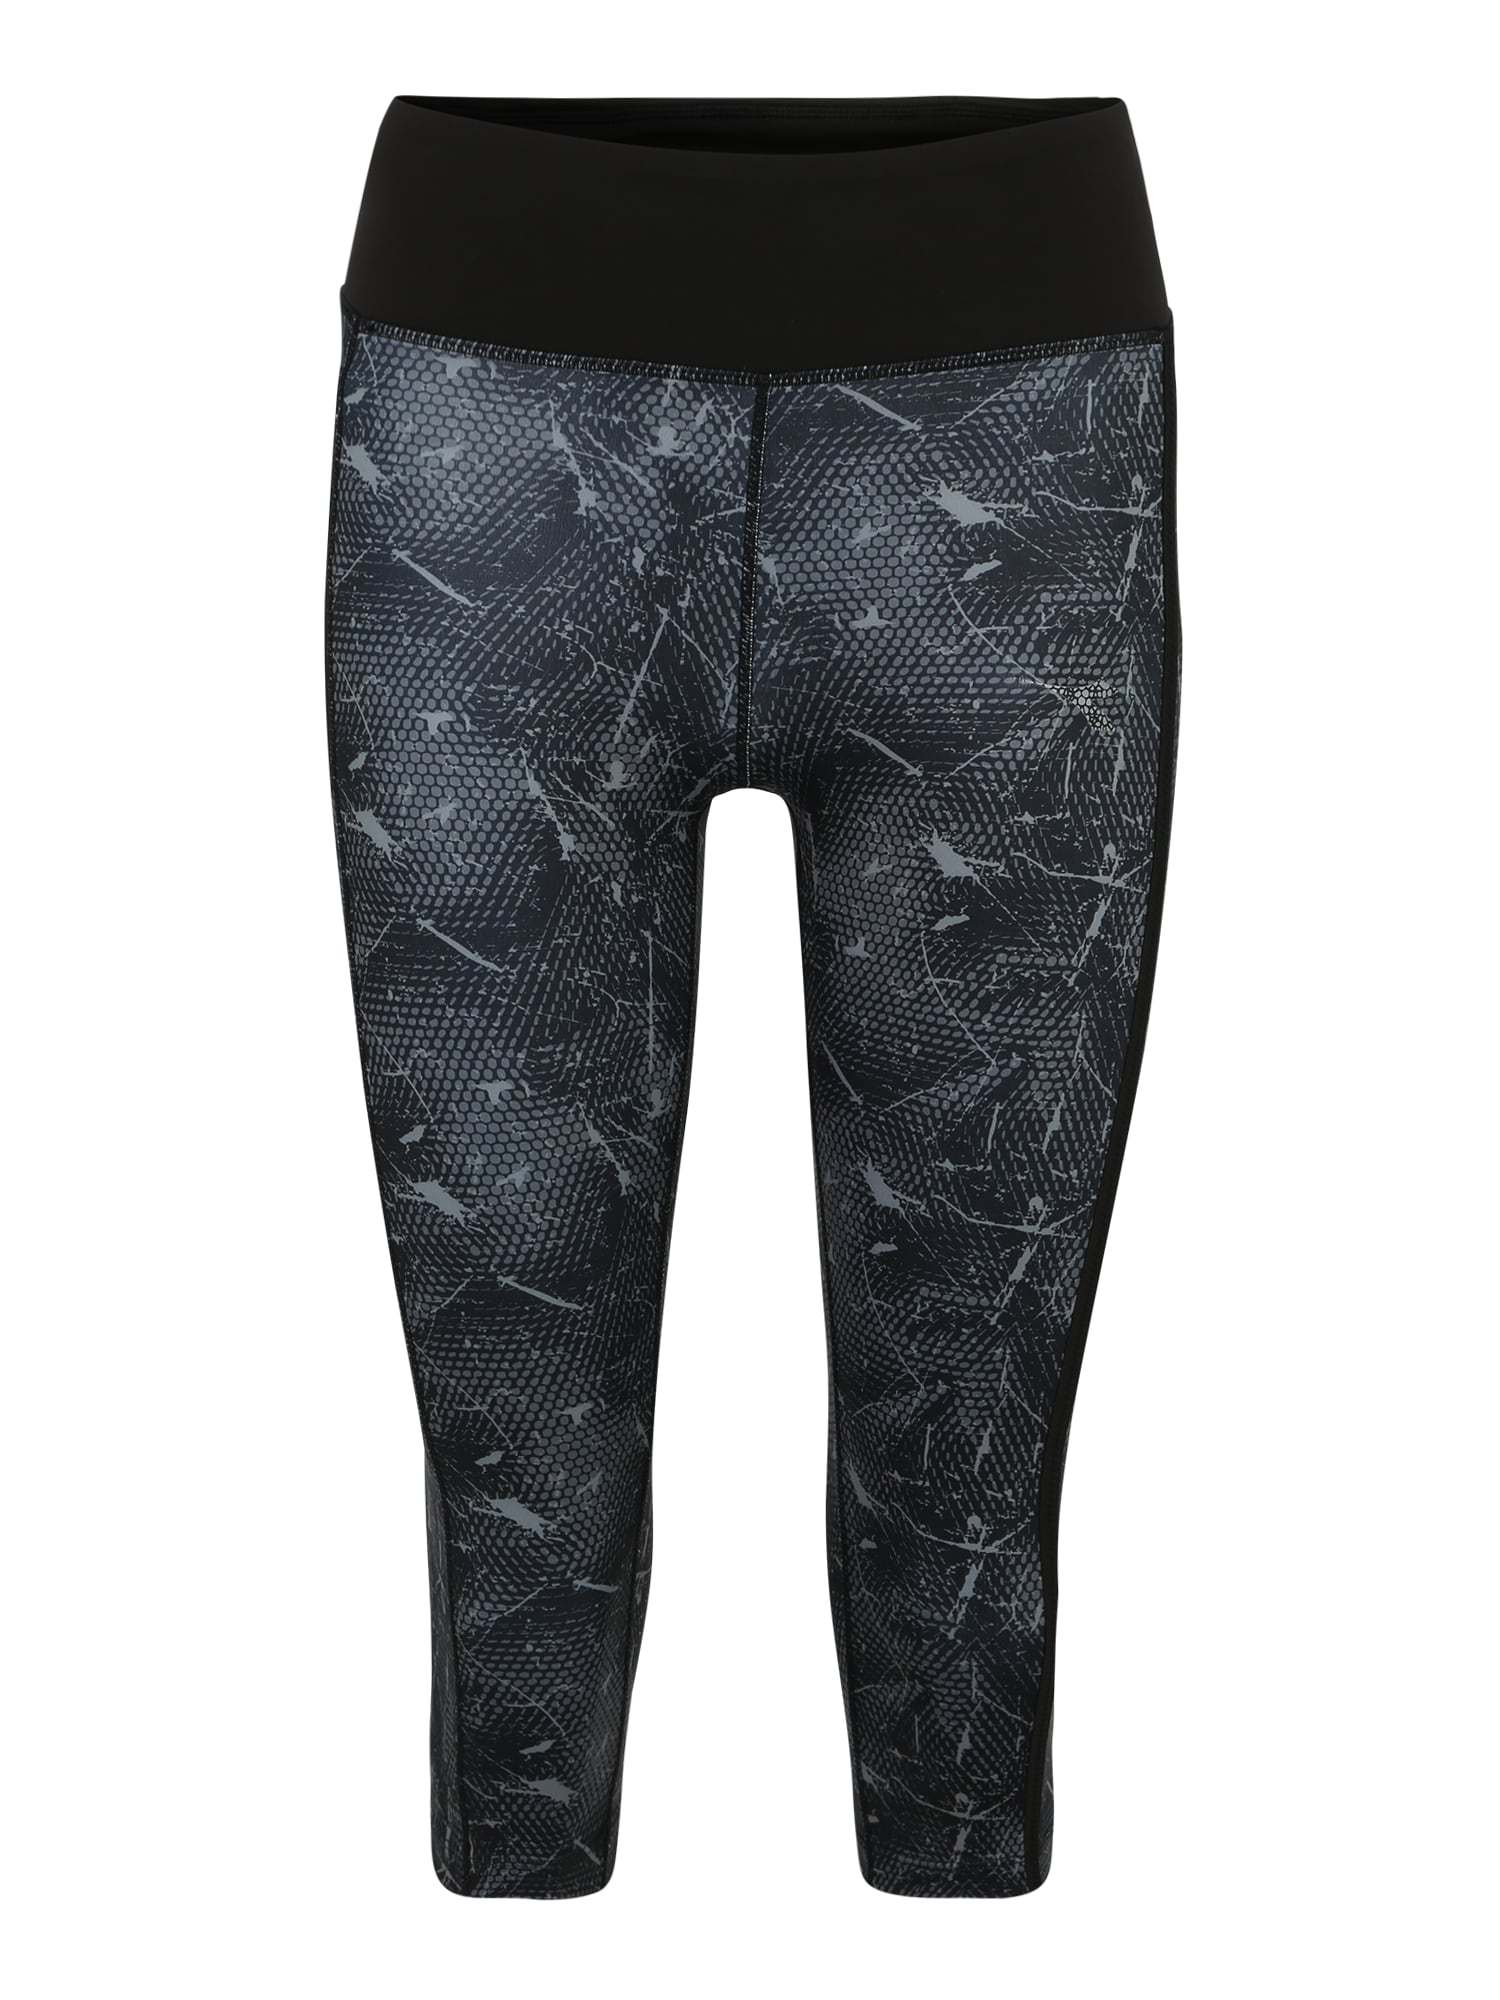 Sportovní kalhoty šedá černá Diadora